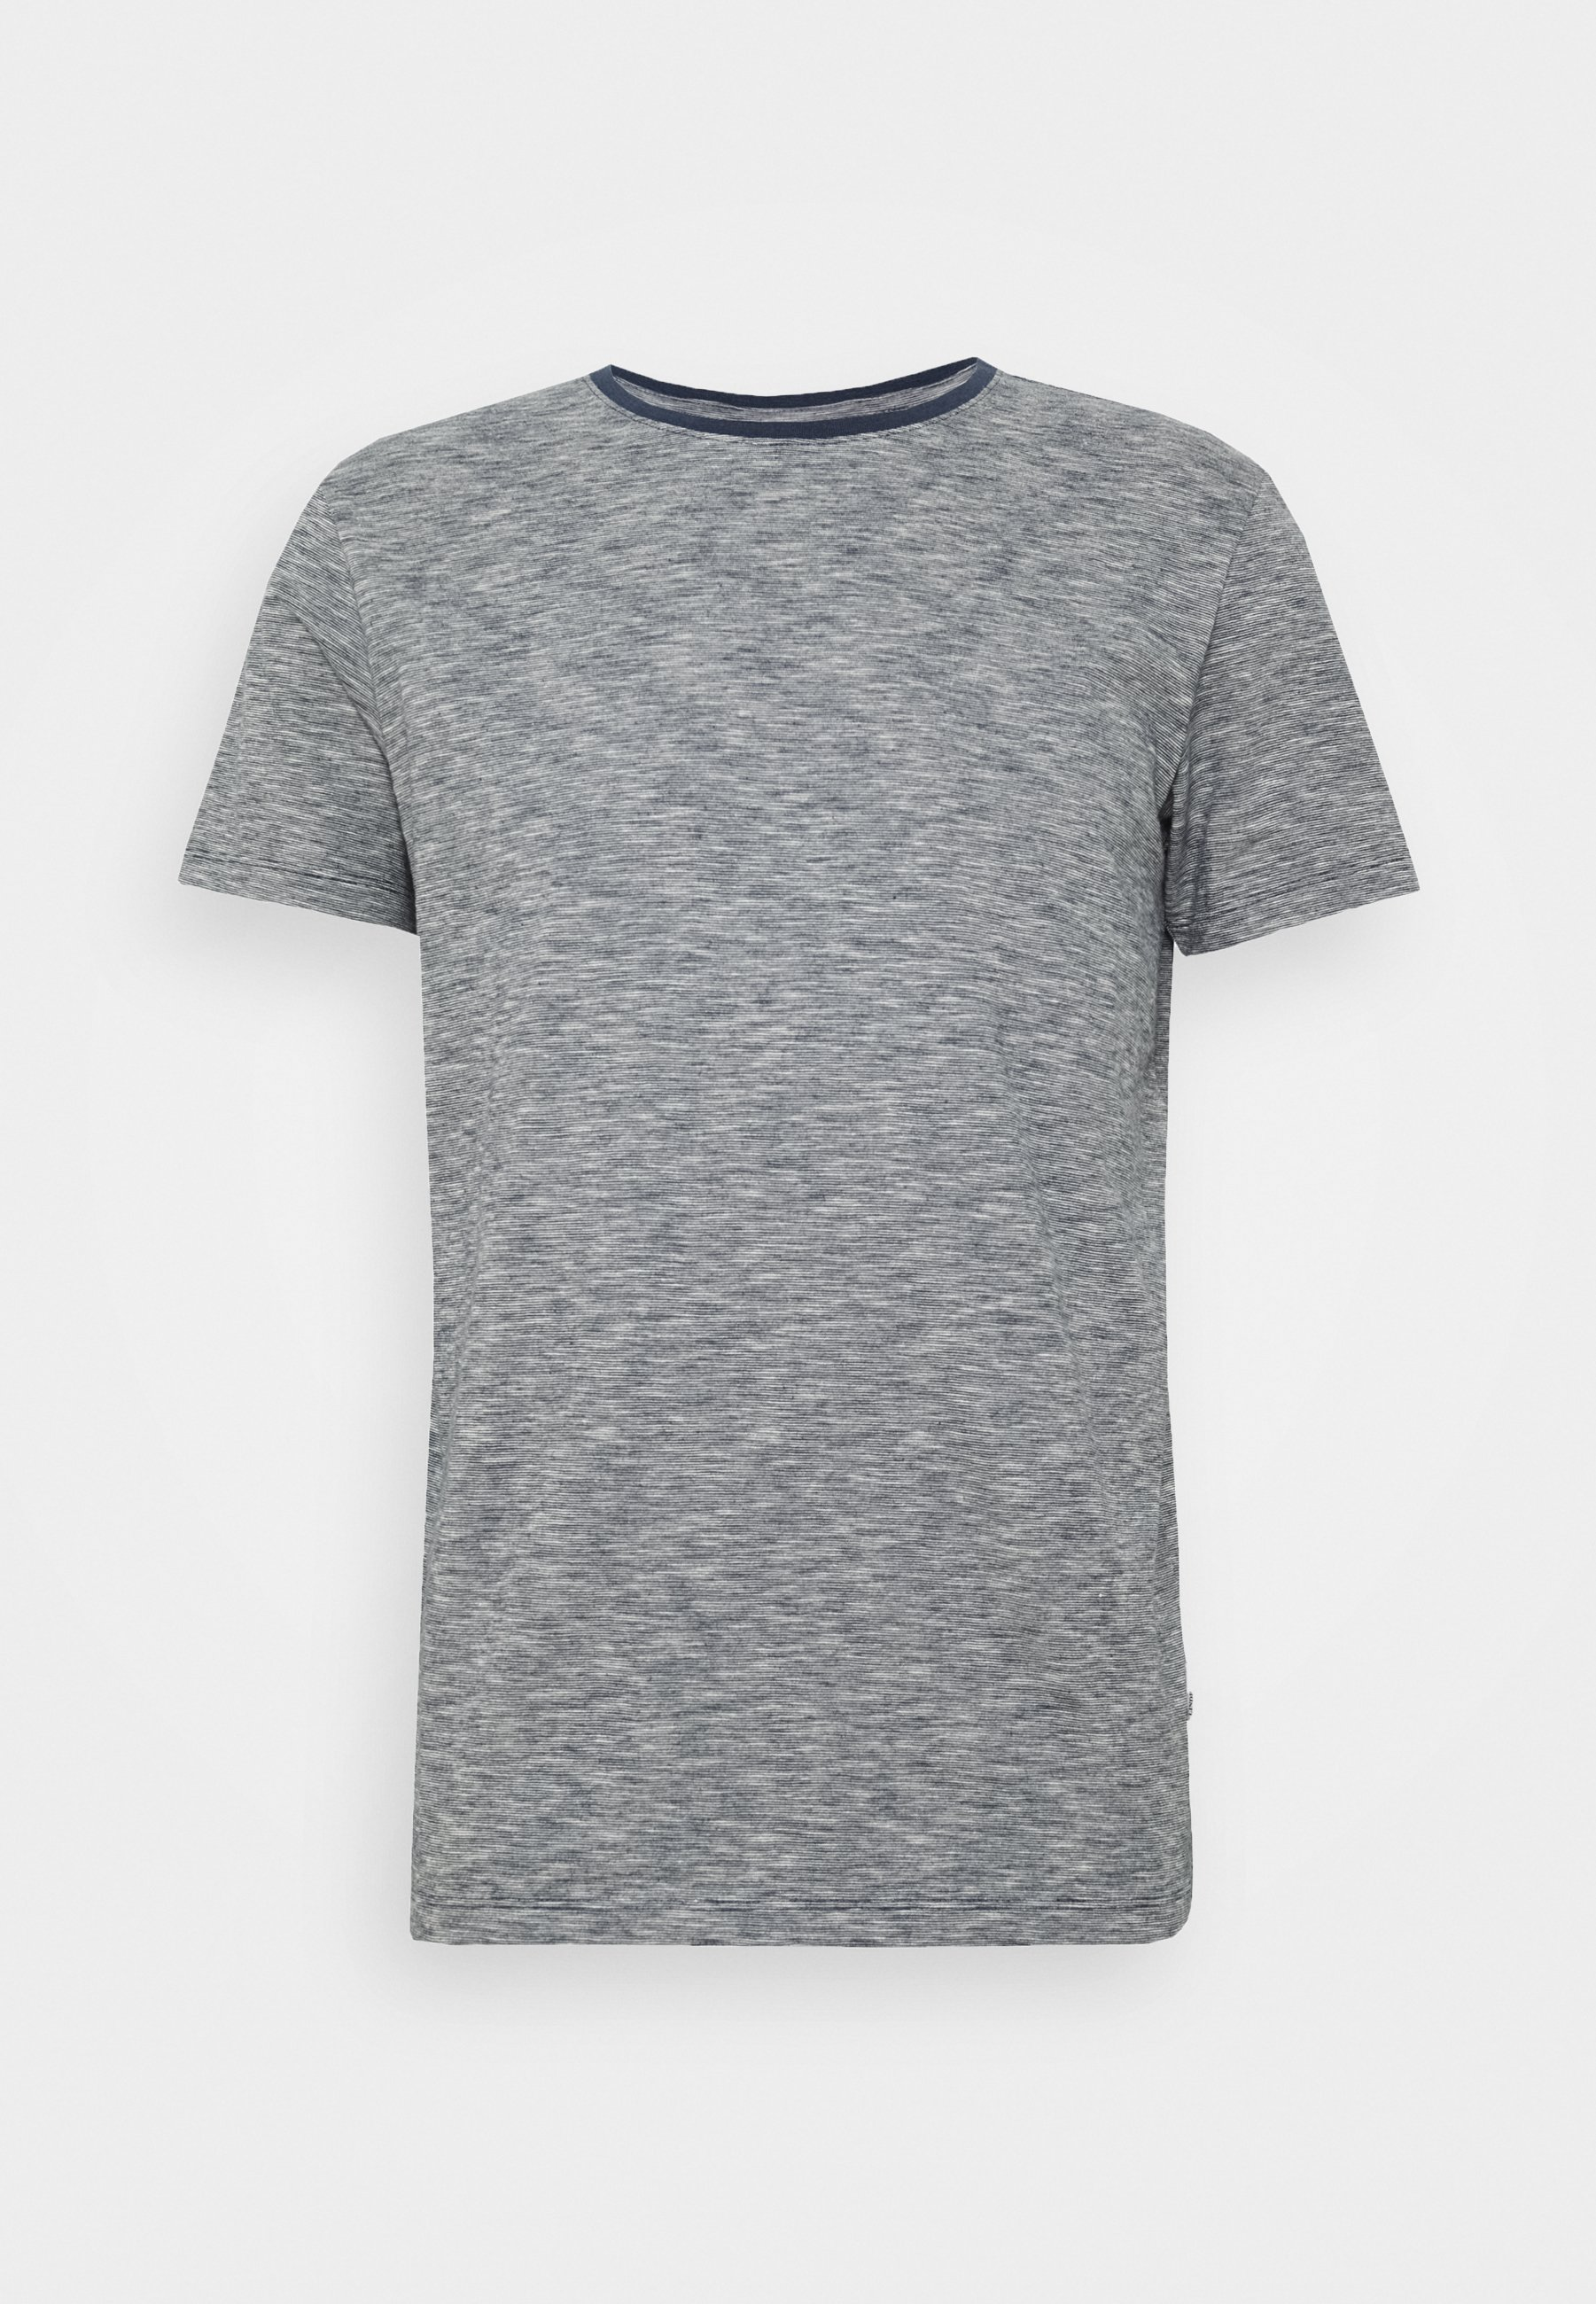 Lindbergh Tee - T-shirts Med Print Navy